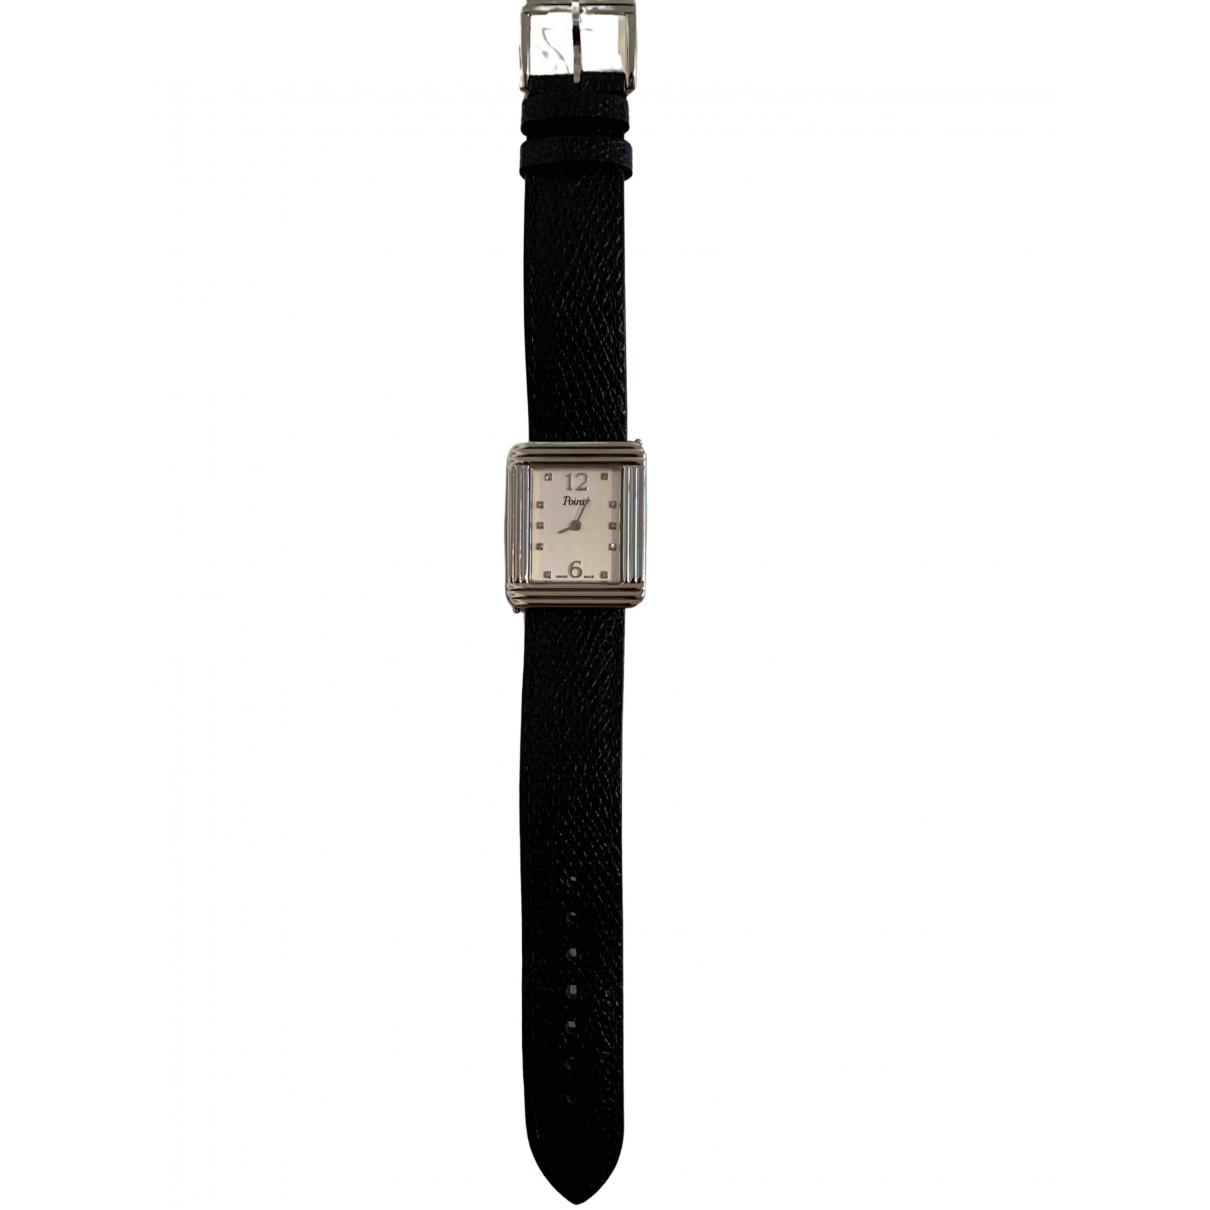 Poiray Ma Premiere Grand Modele Uhr in  Silber Stahl